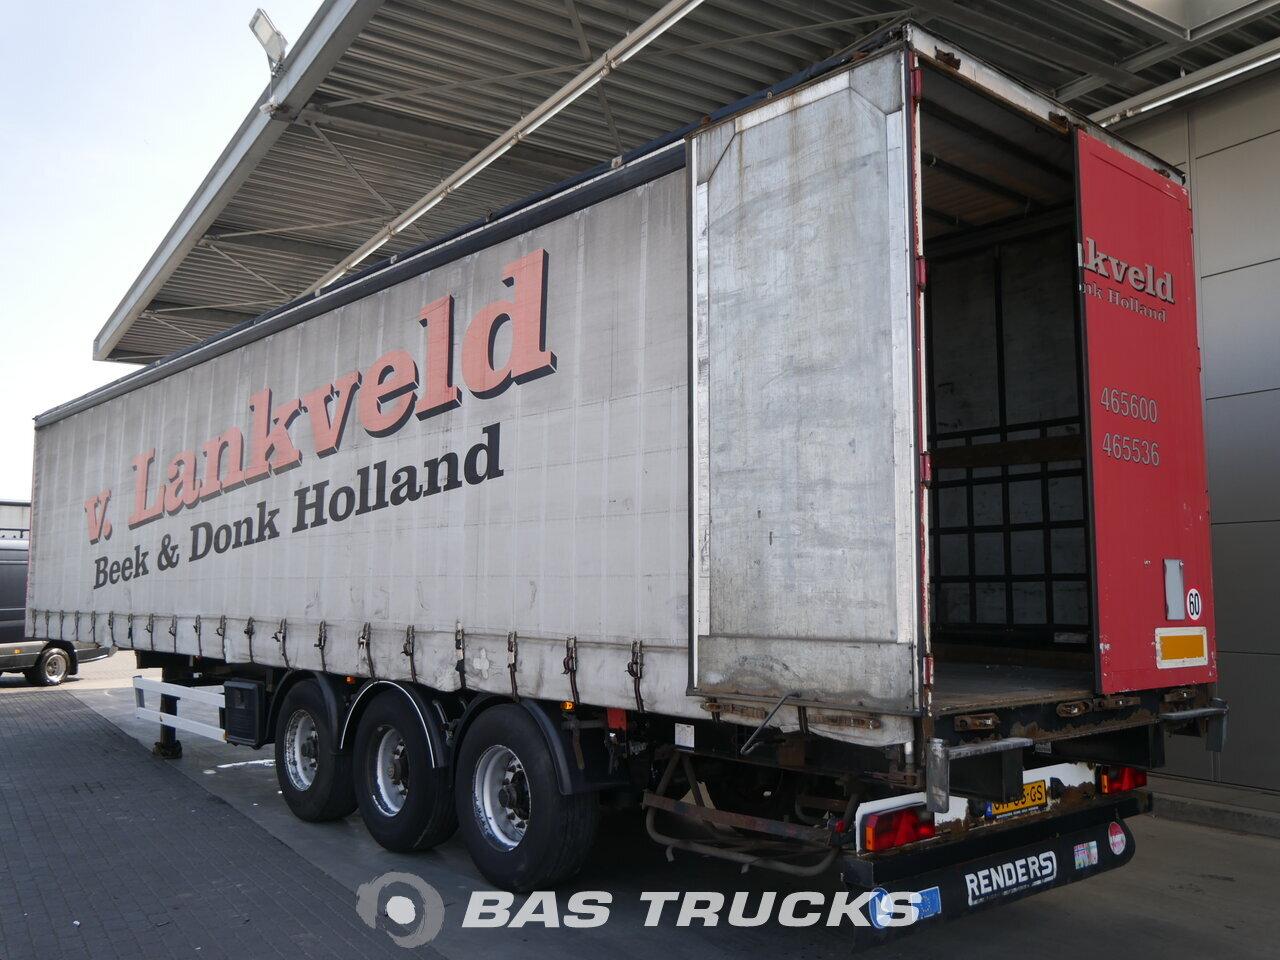 For sale at BAS Trucks: Renders Hartholz-Bodem Anti-Vandalimus-Plane B302  07/2003